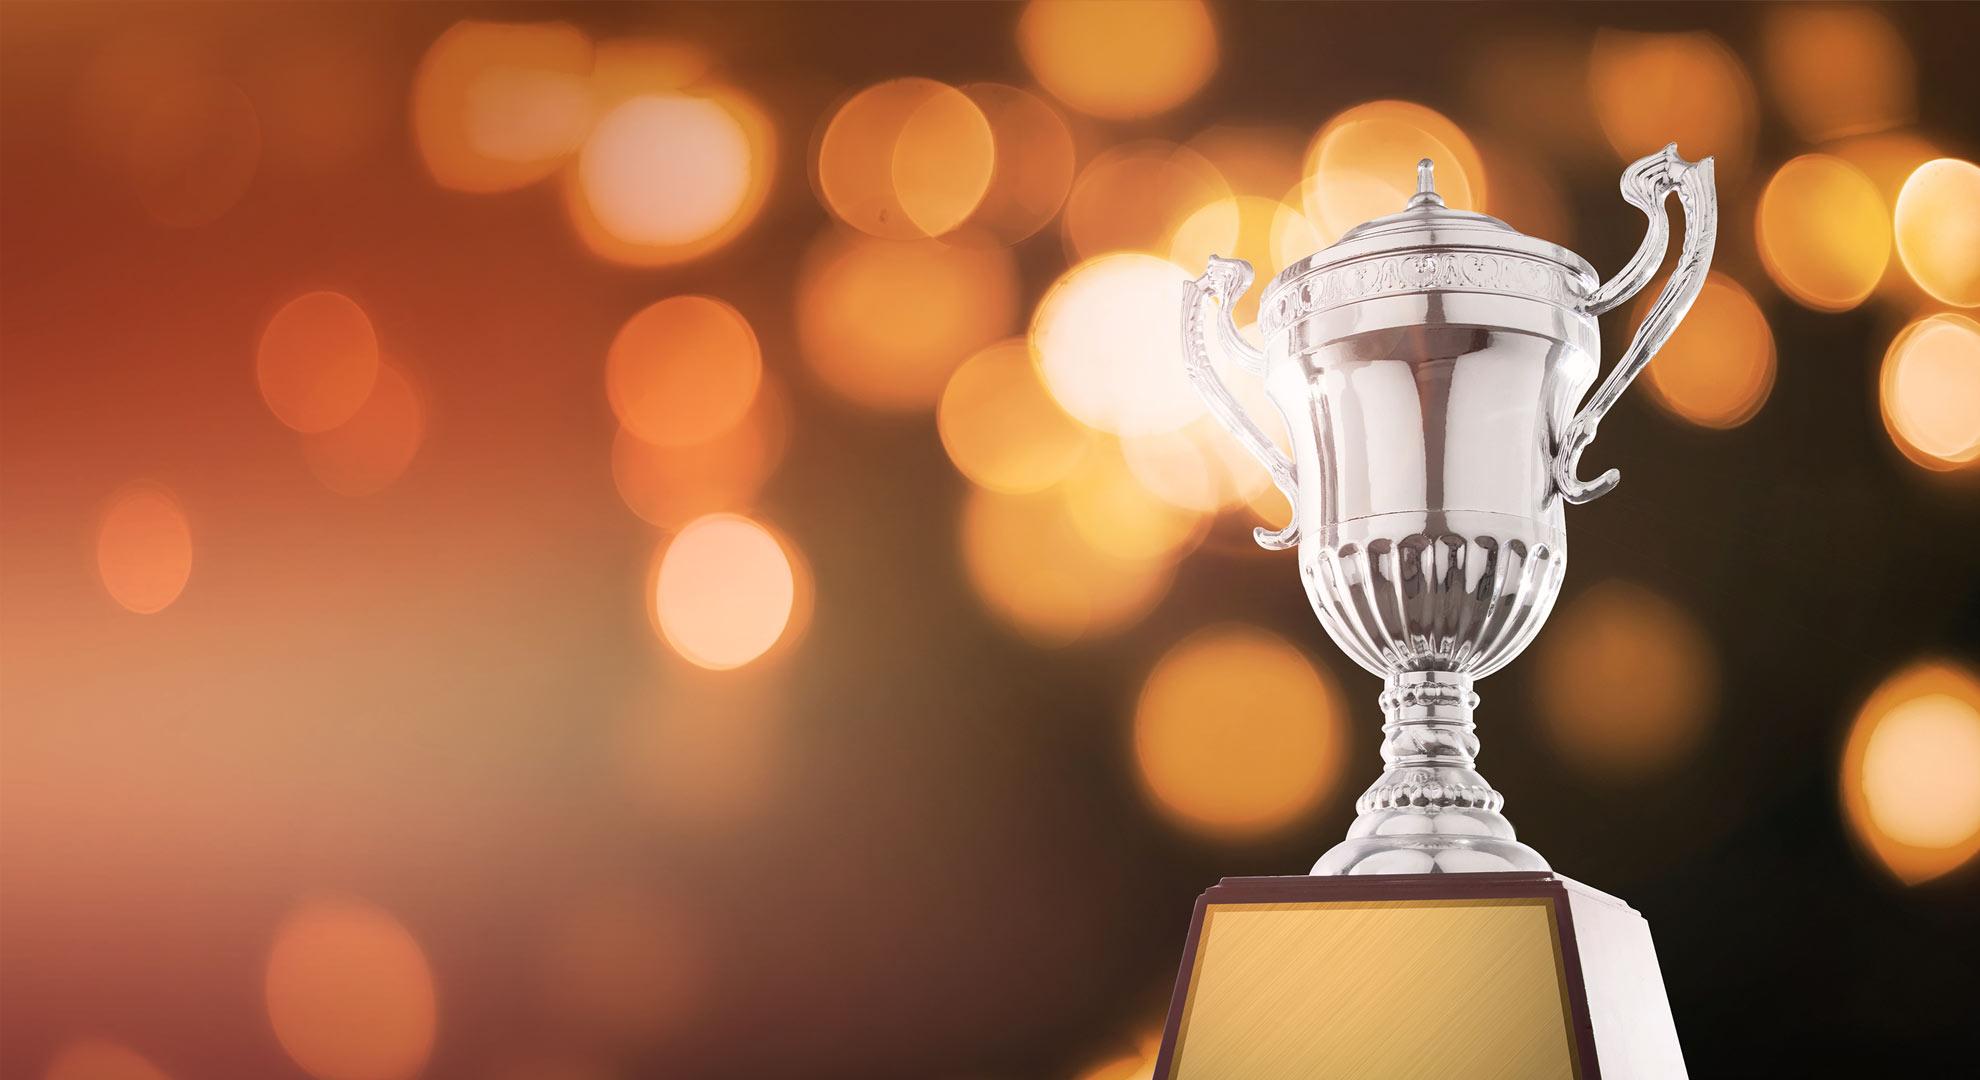 wns wins seven stevie awards